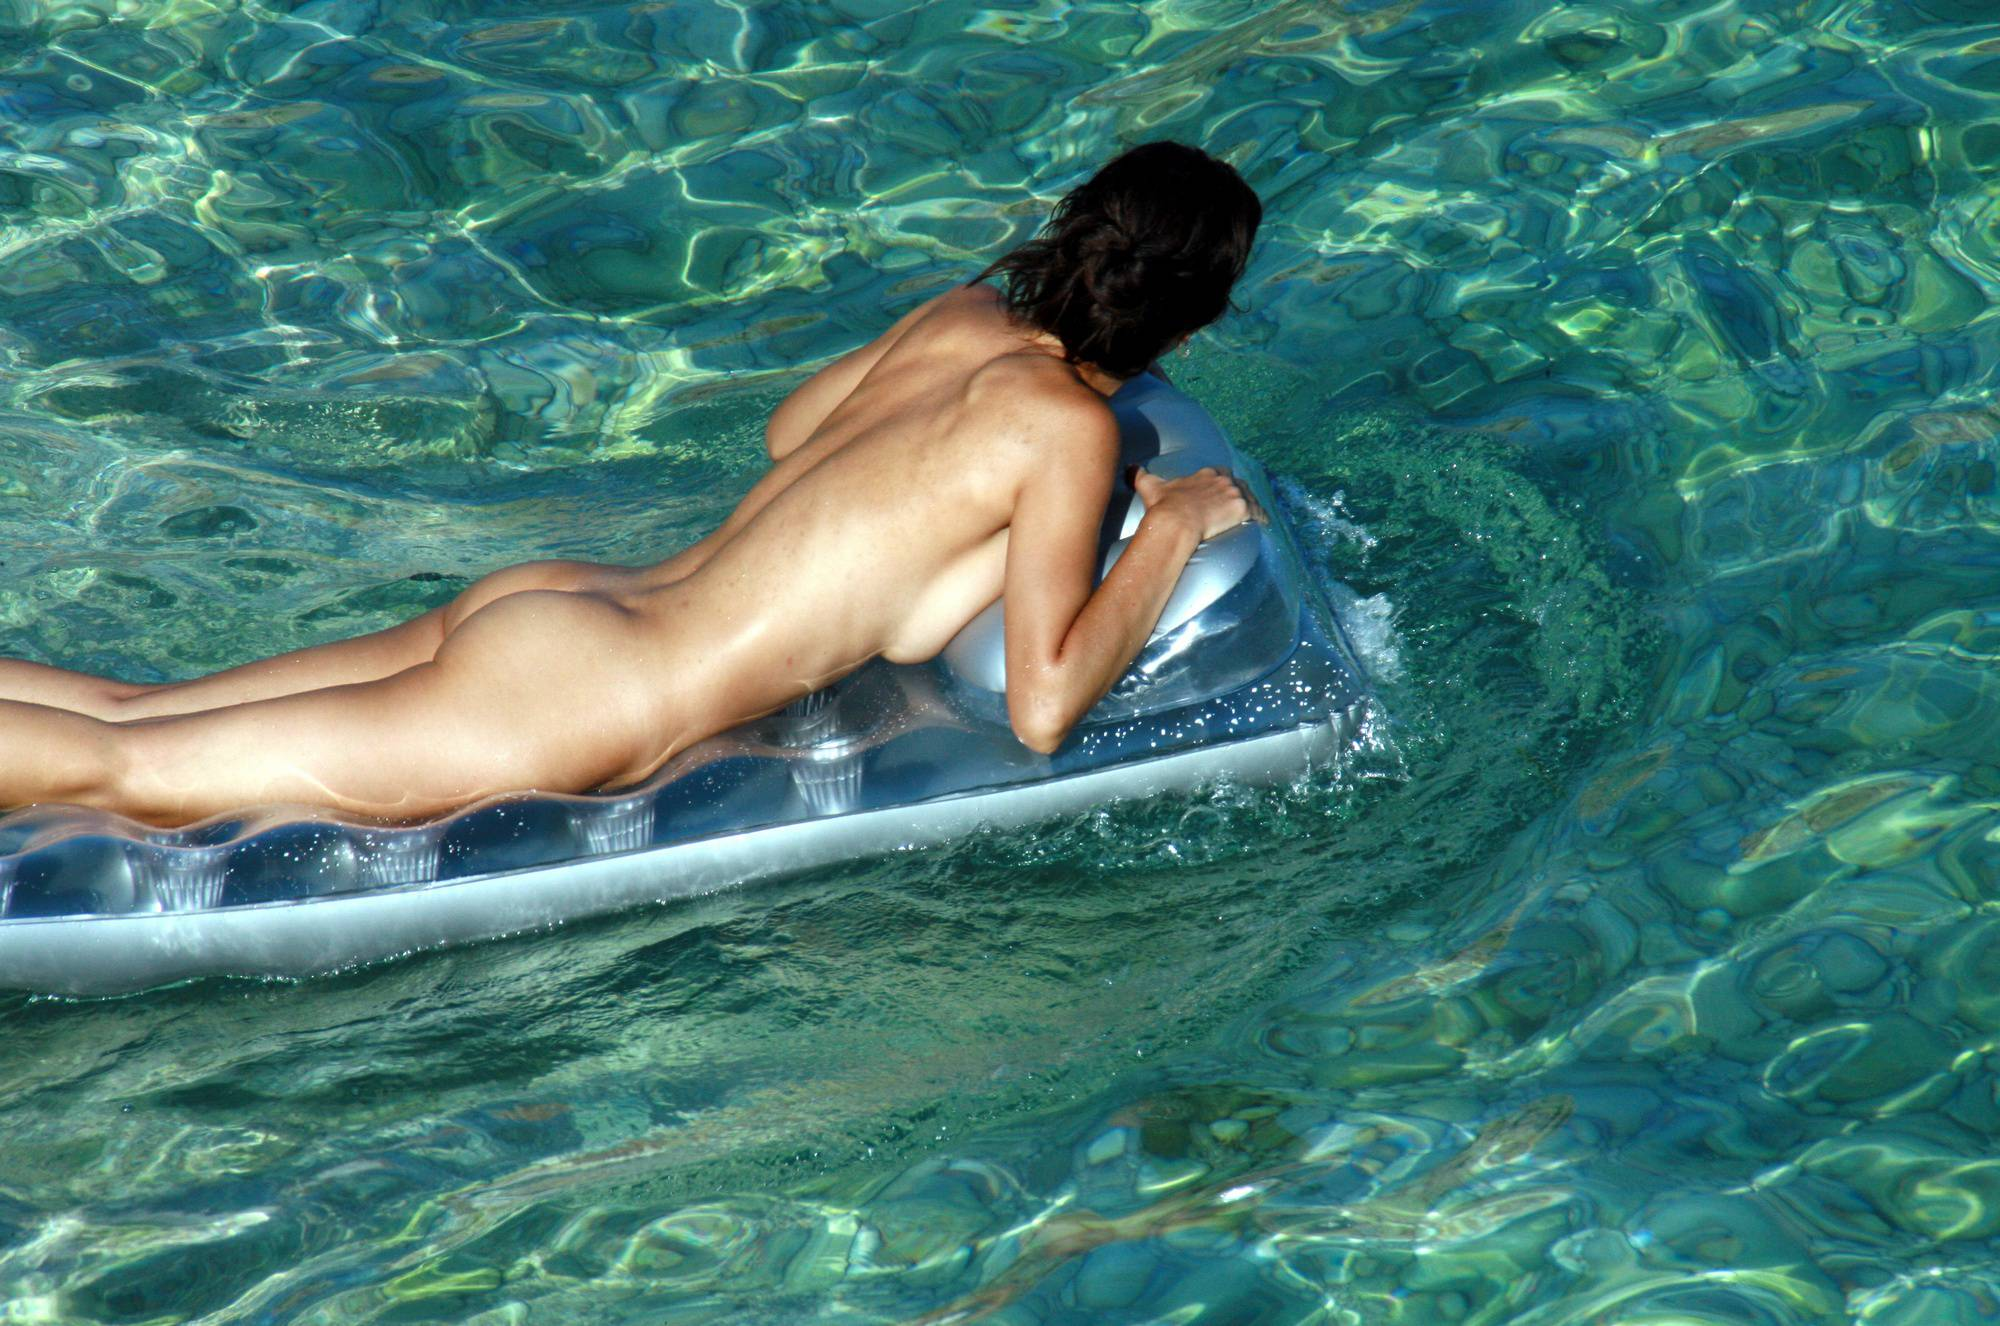 Nudist Couple Gray Floater - 2